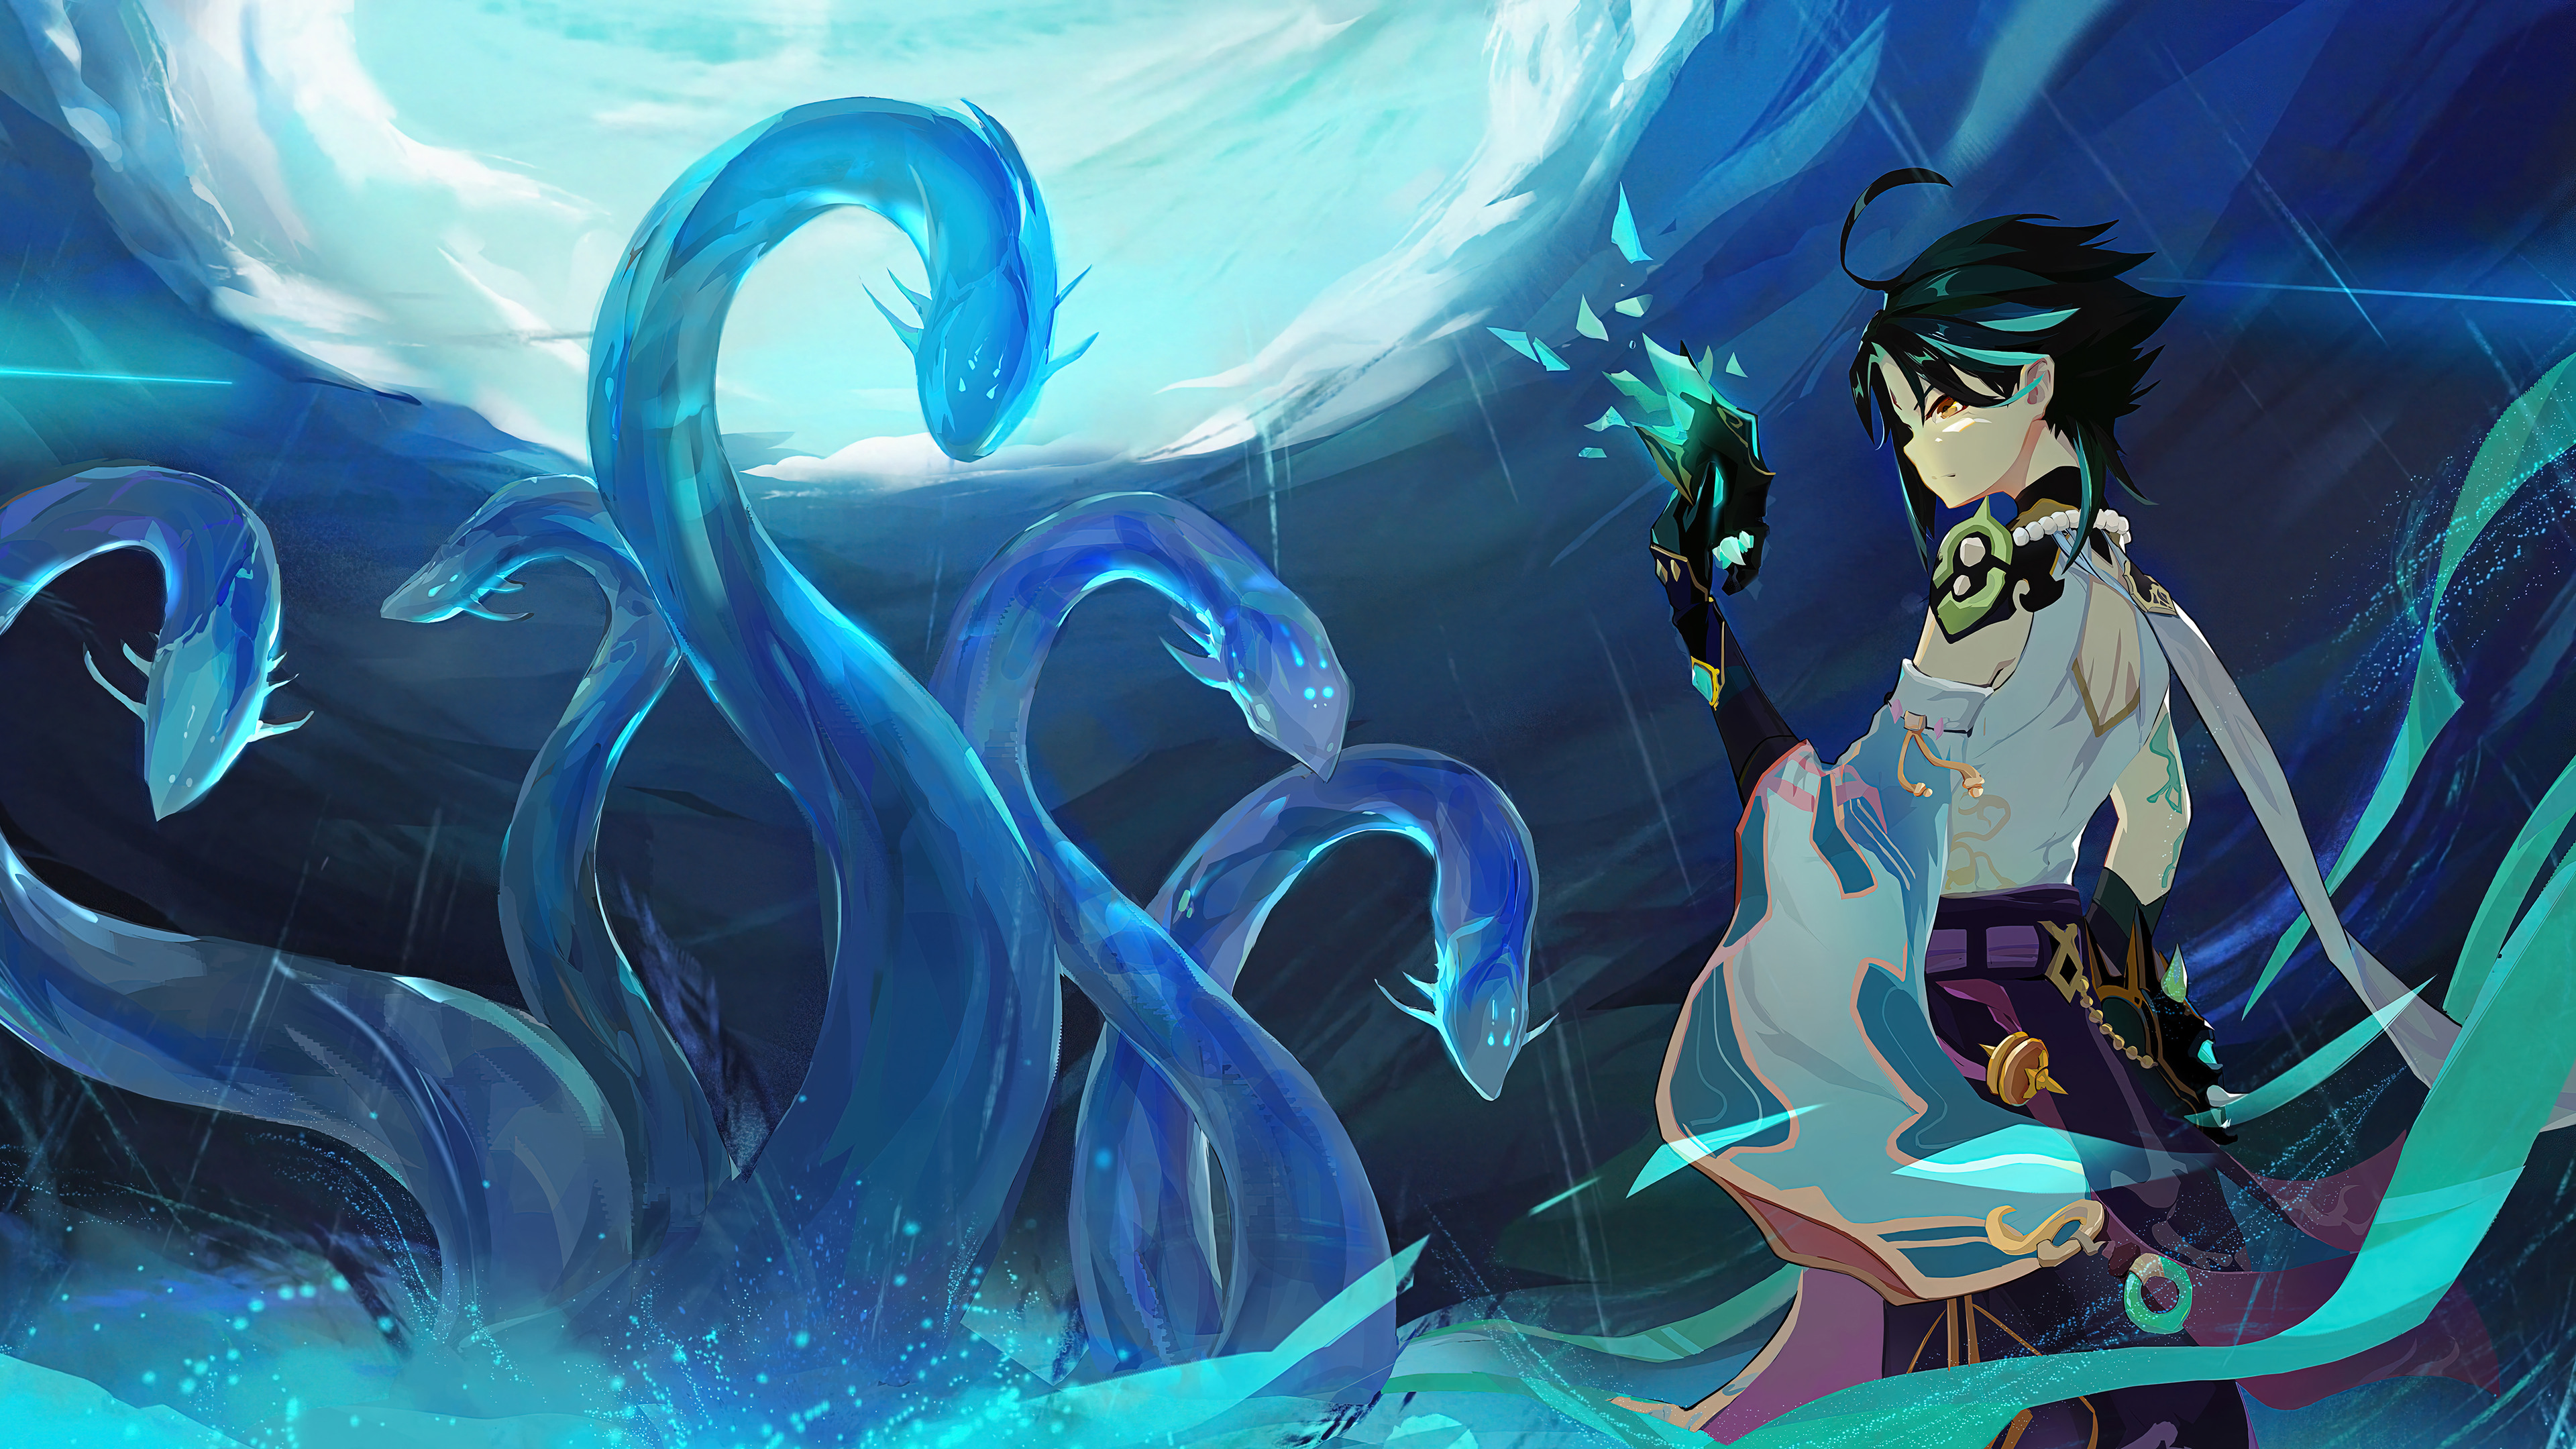 Fondos de pantalla Anime Personaje Xiao de Genshin Impact